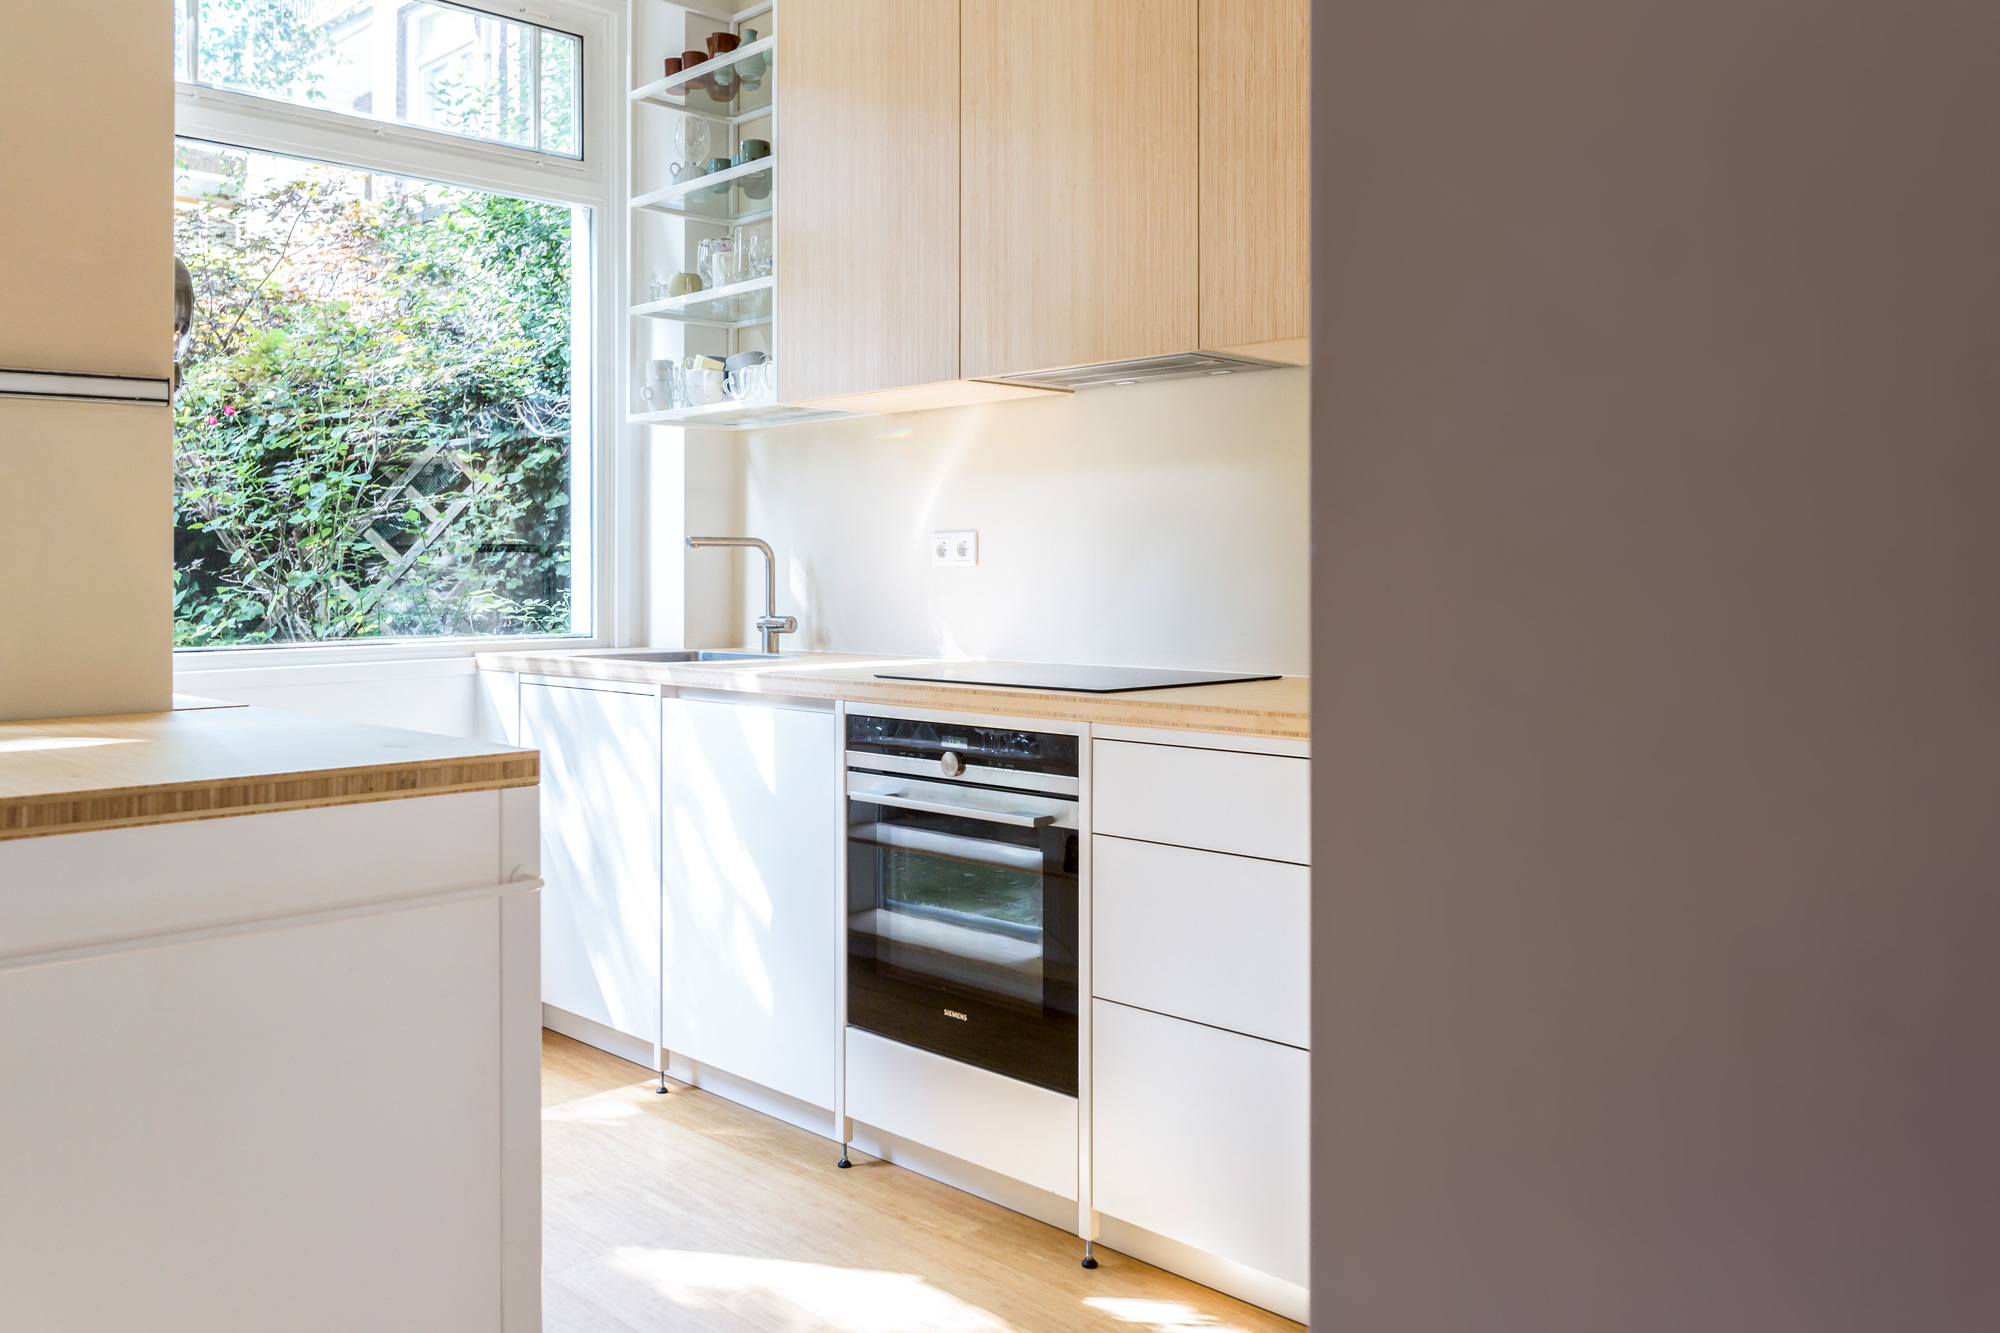 Stalen frame keuken met bamboe en keukentrolley